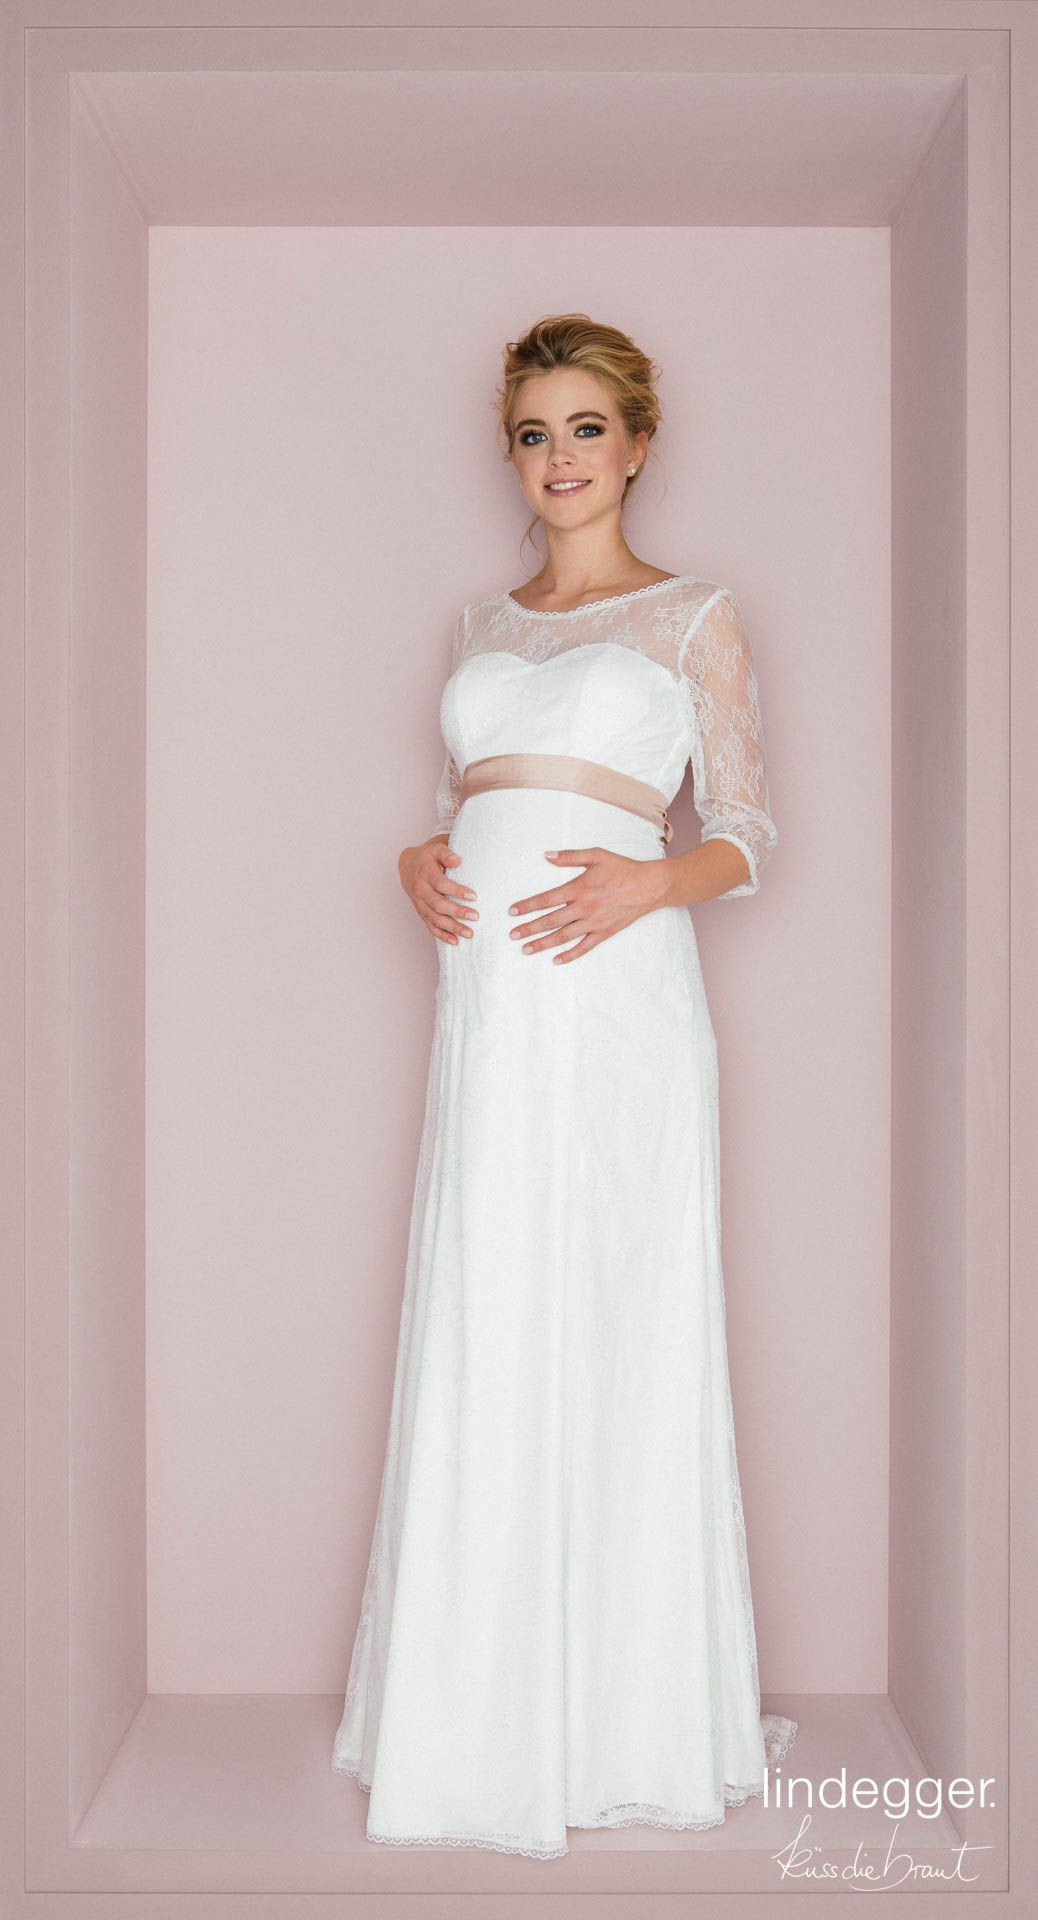 Pin Von Russell Wedding Management Company Auf Maternity